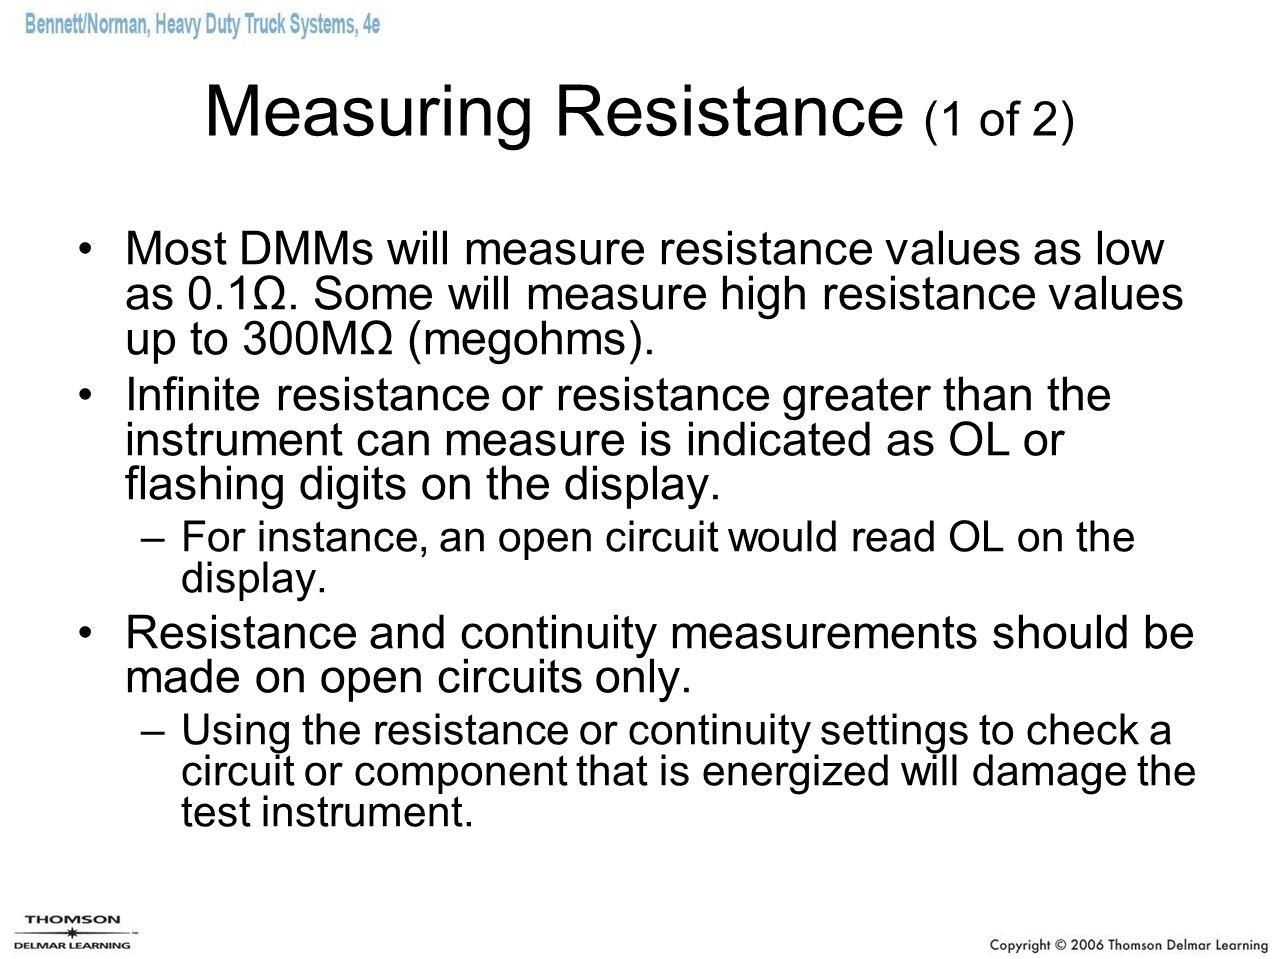 Measuring Resistance (1 of 2)